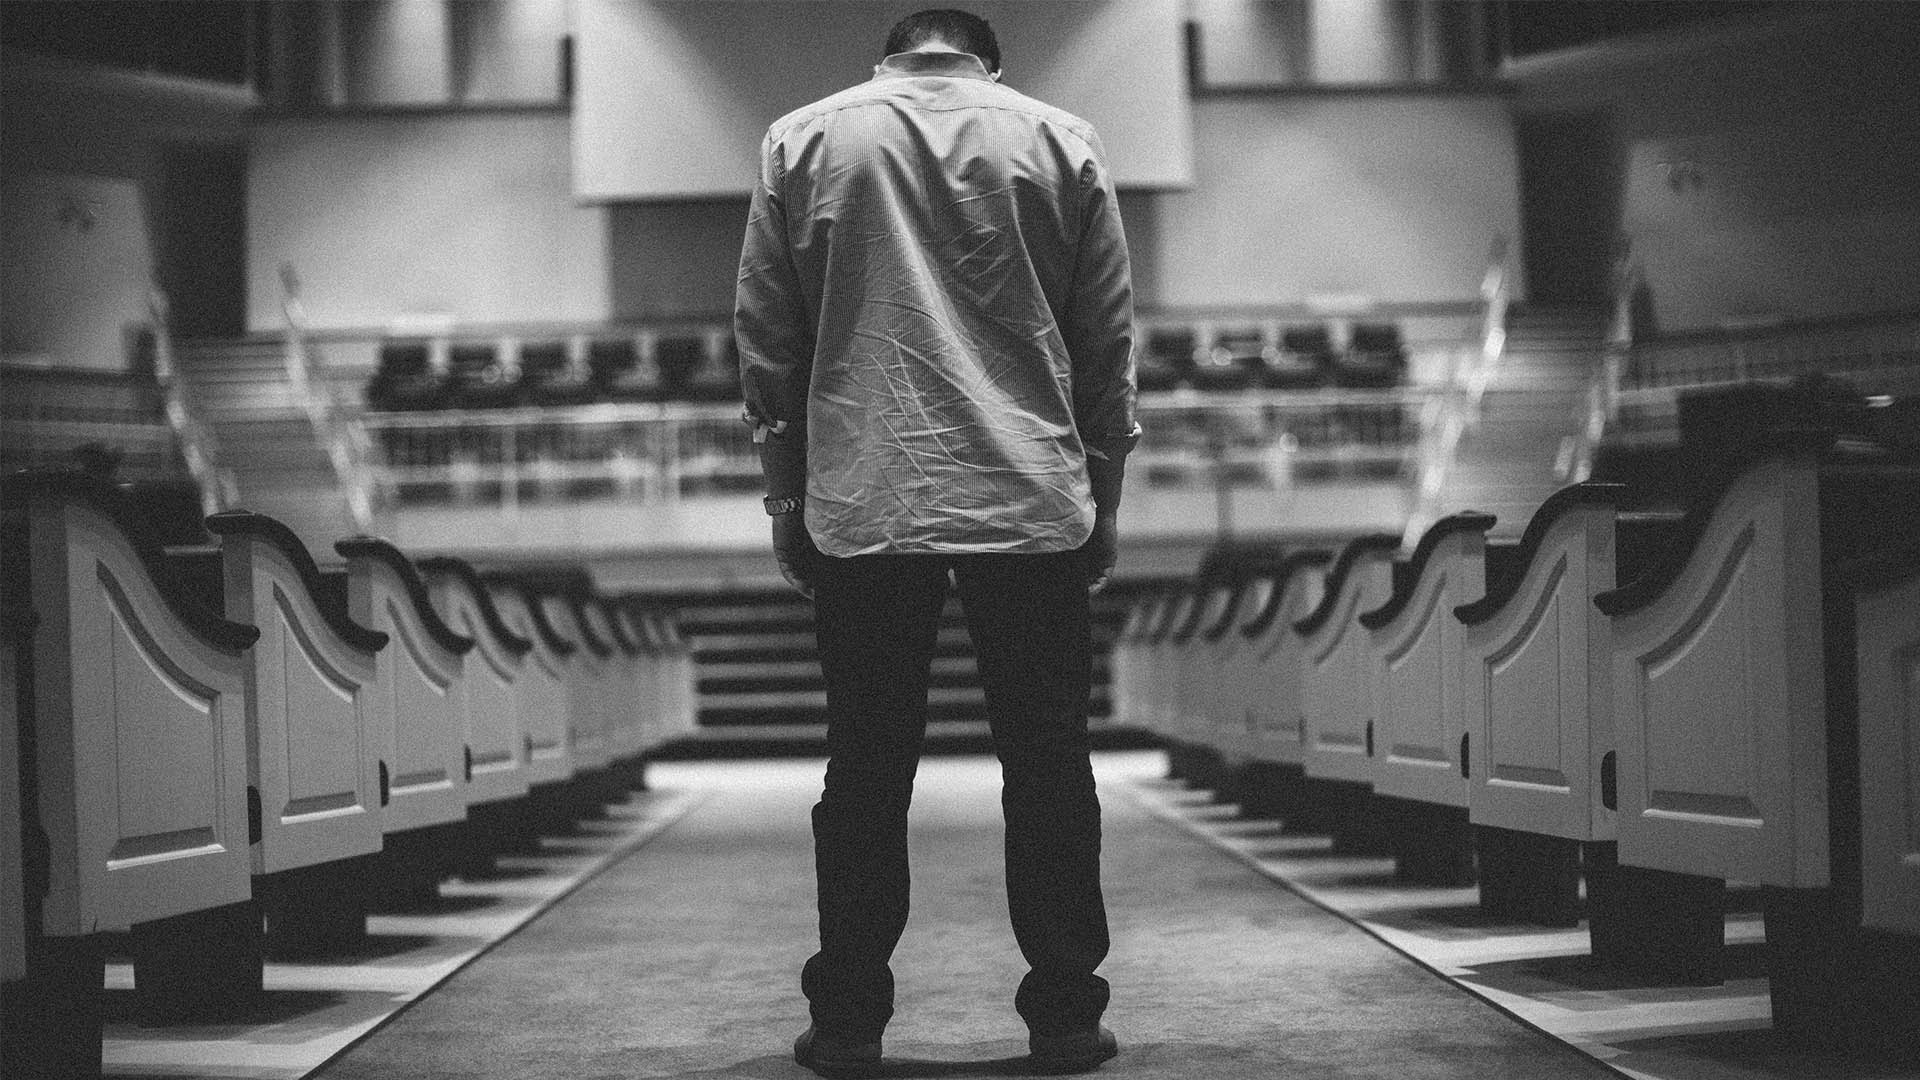 The Audacity of Worship